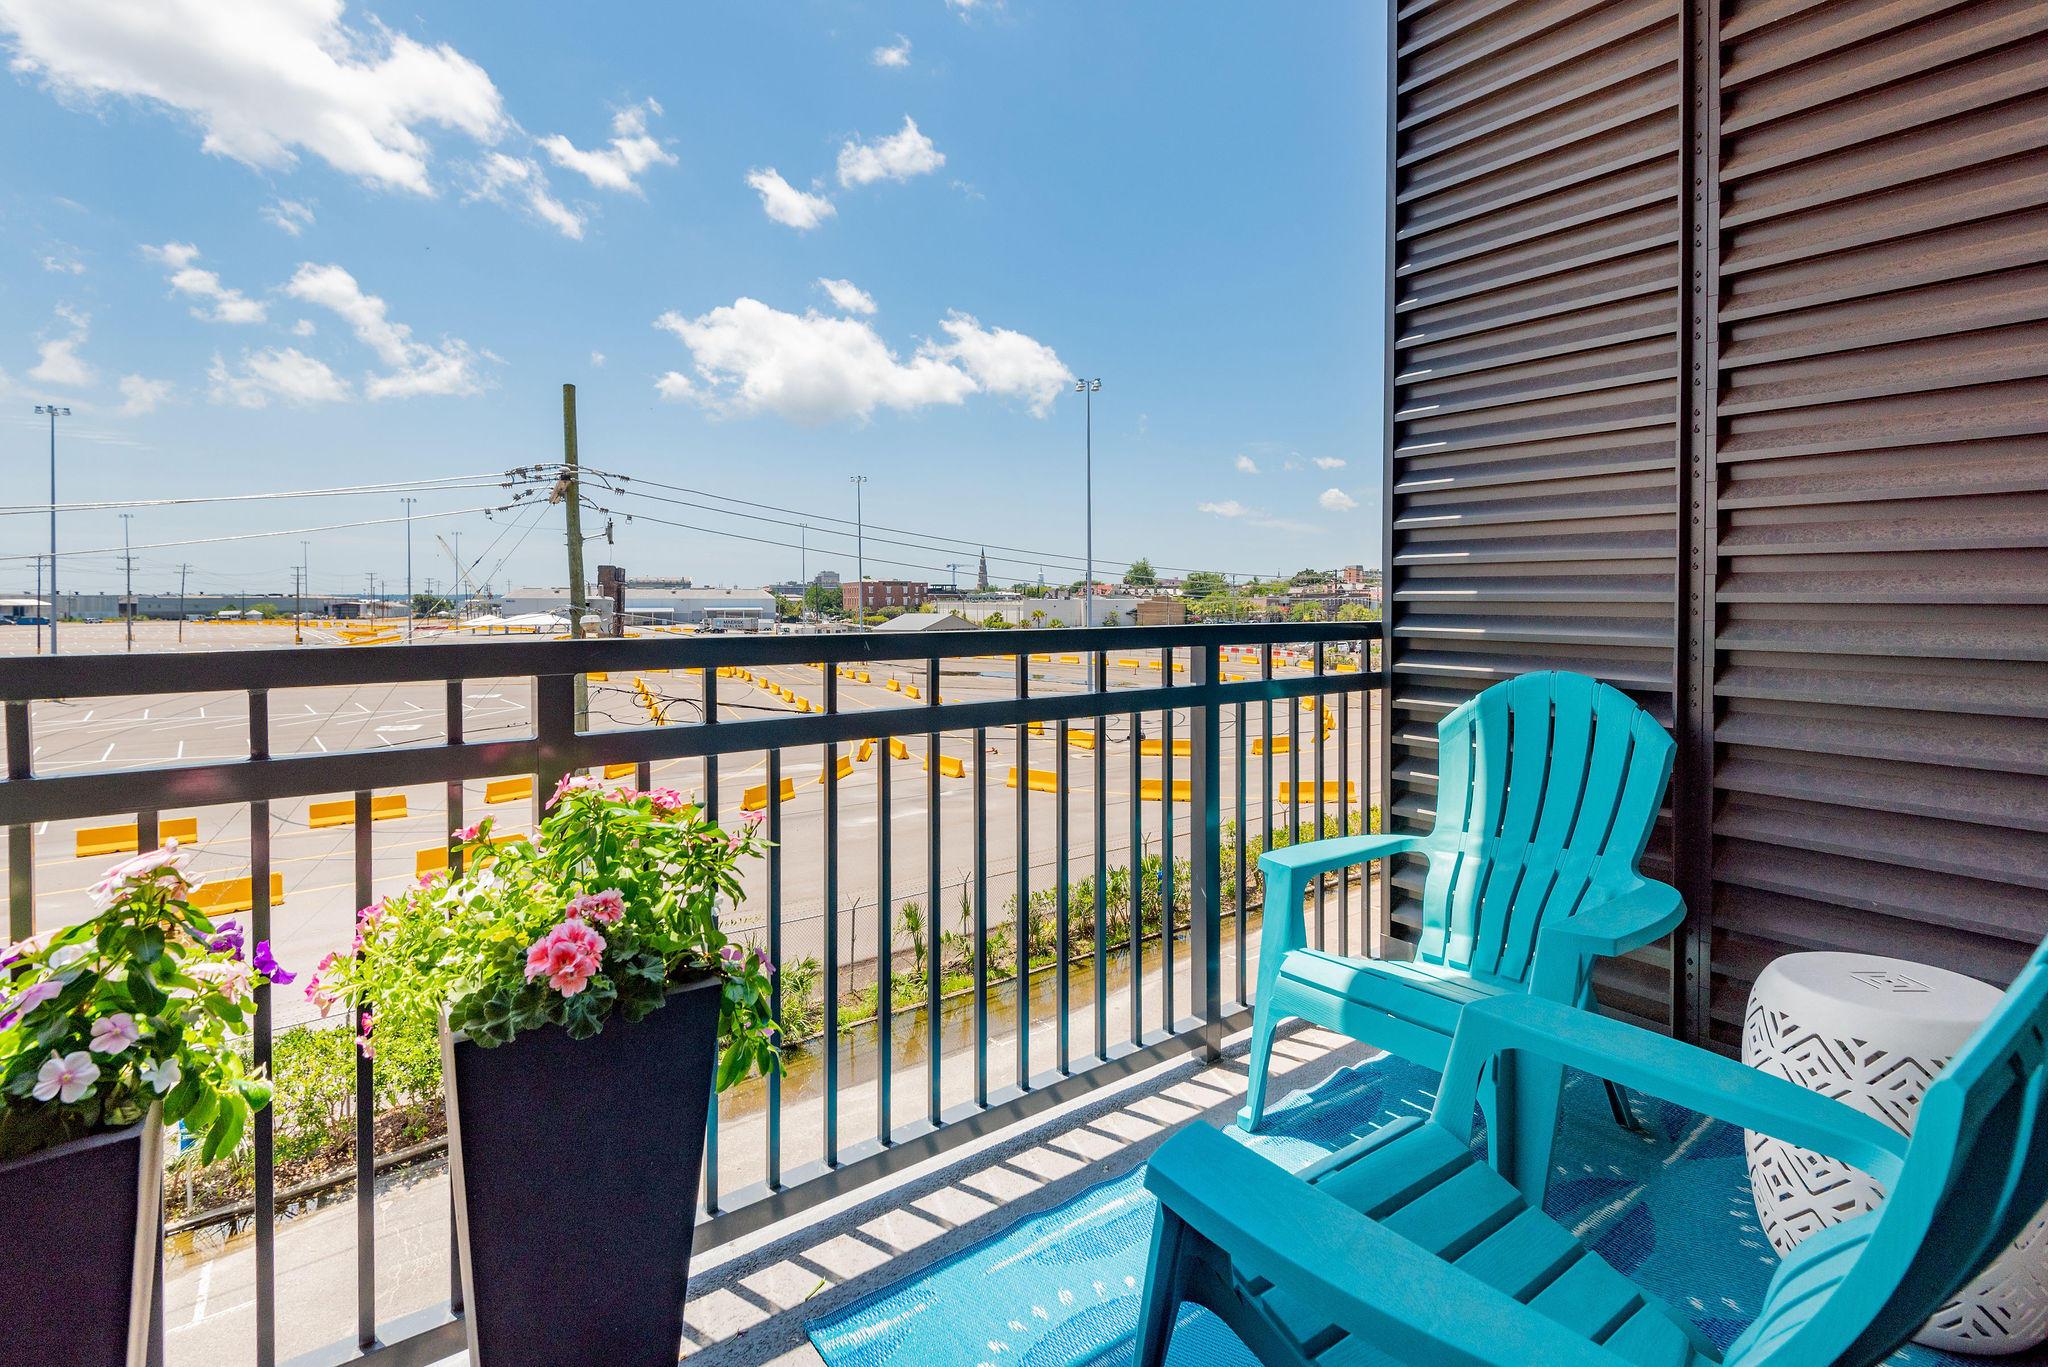 Gadsdenboro Homes For Sale - 5 Gadsdenboro, Charleston, SC - 24